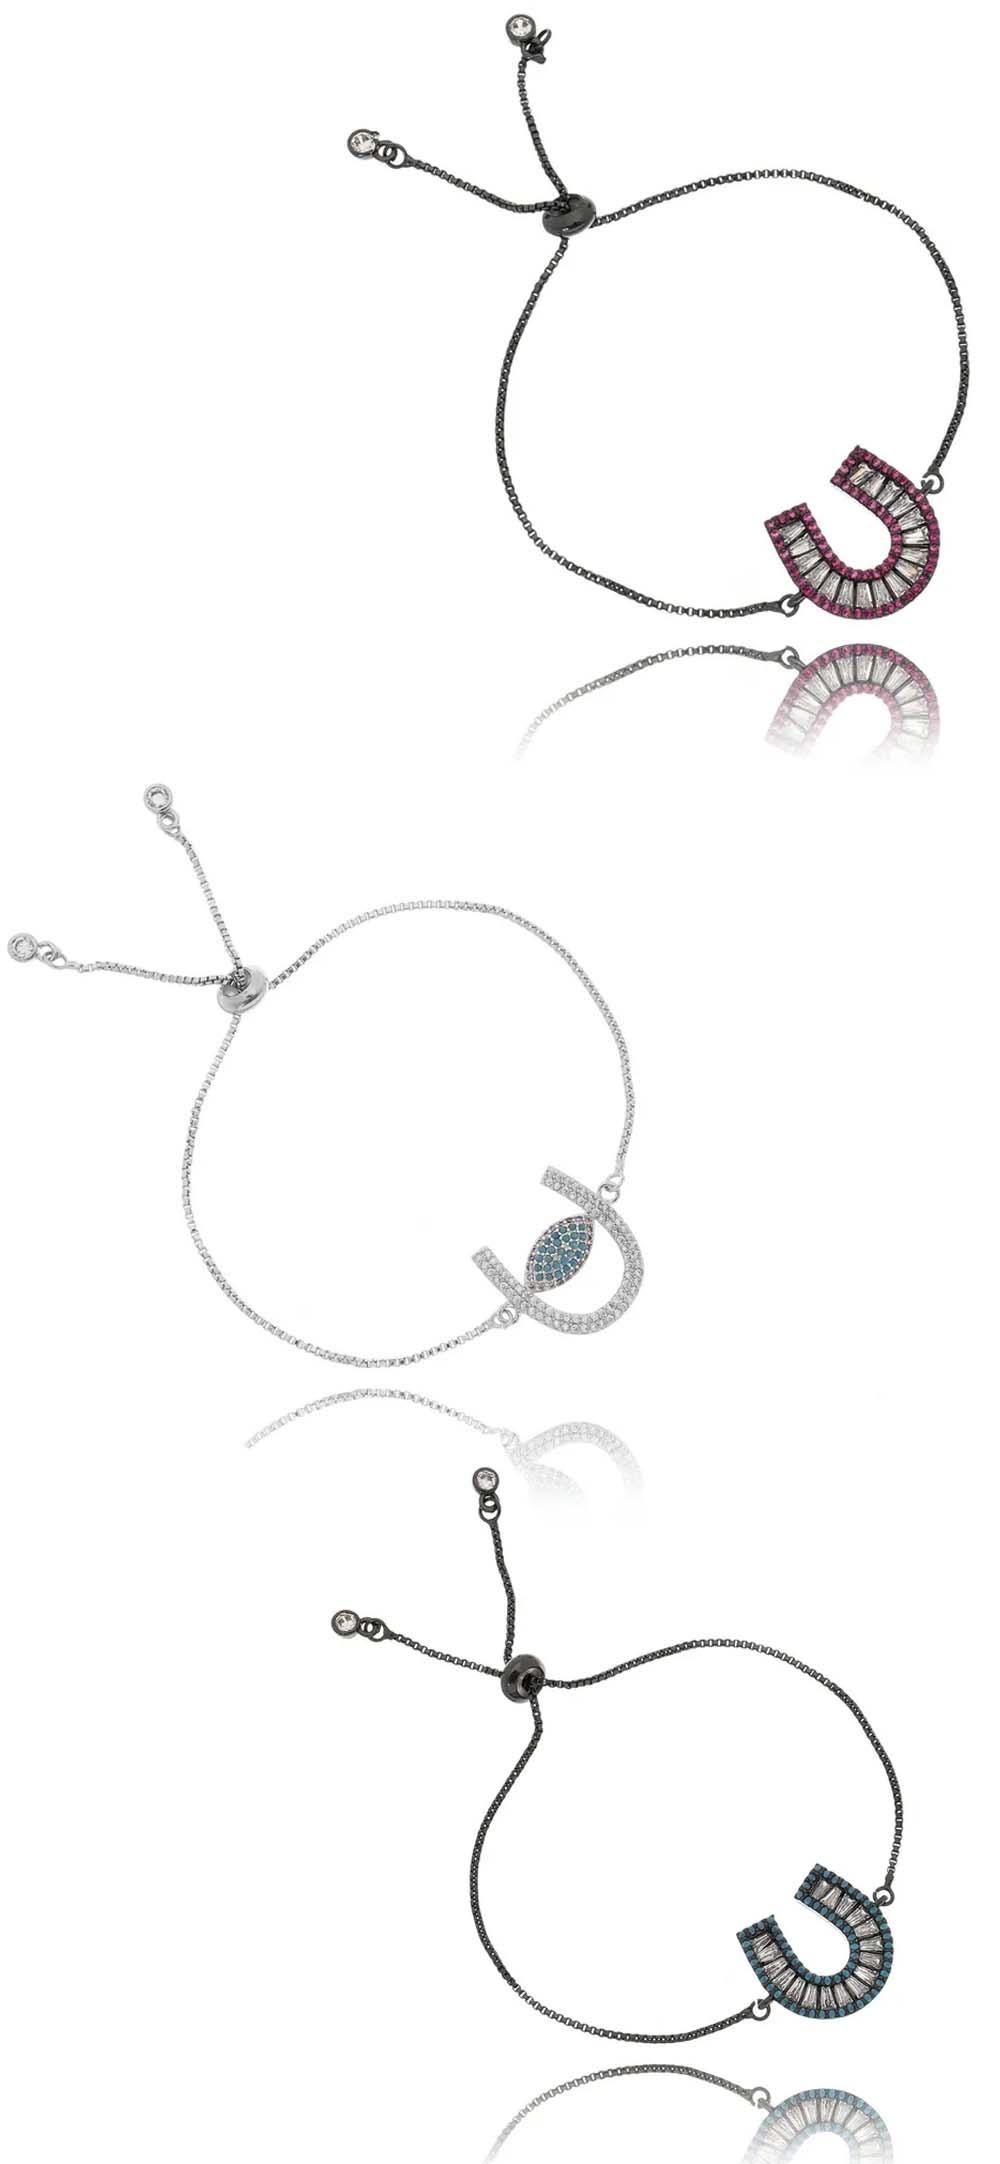 pulseiras da sorte ferradura